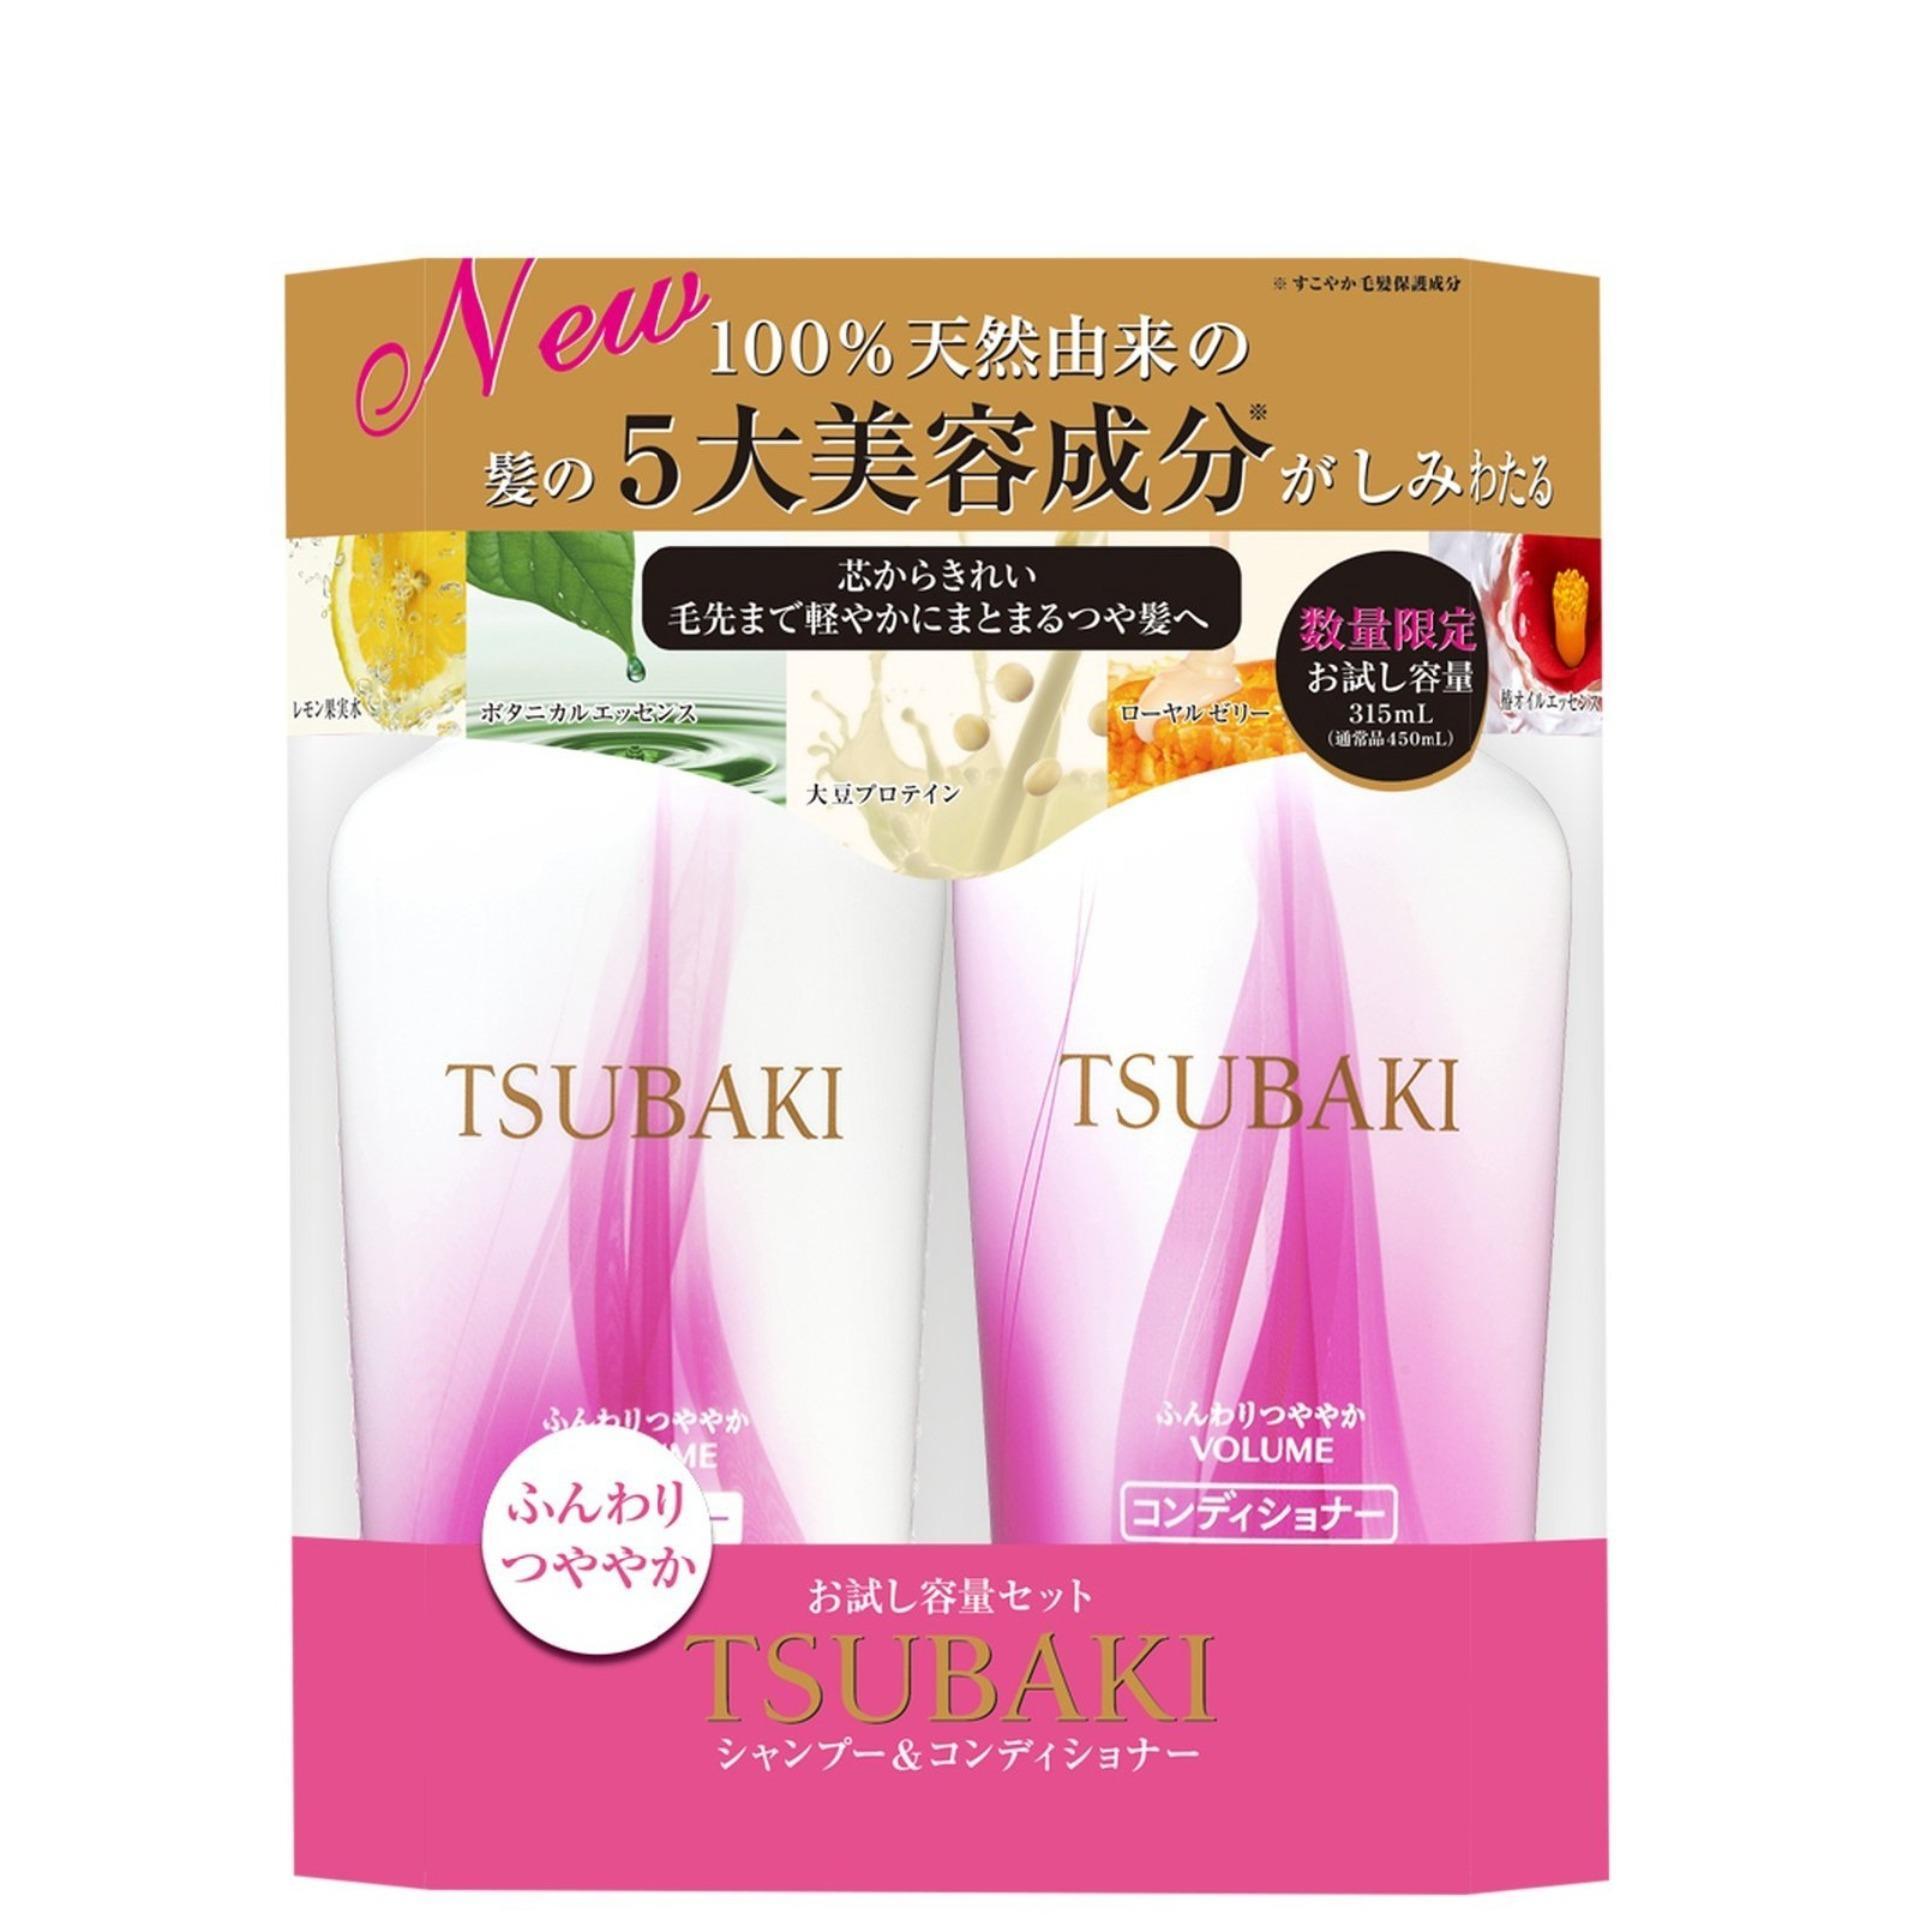 Mua Bộ Dầu Gội Va Dầu Xả Shiseido Tsubaki Volume Touch